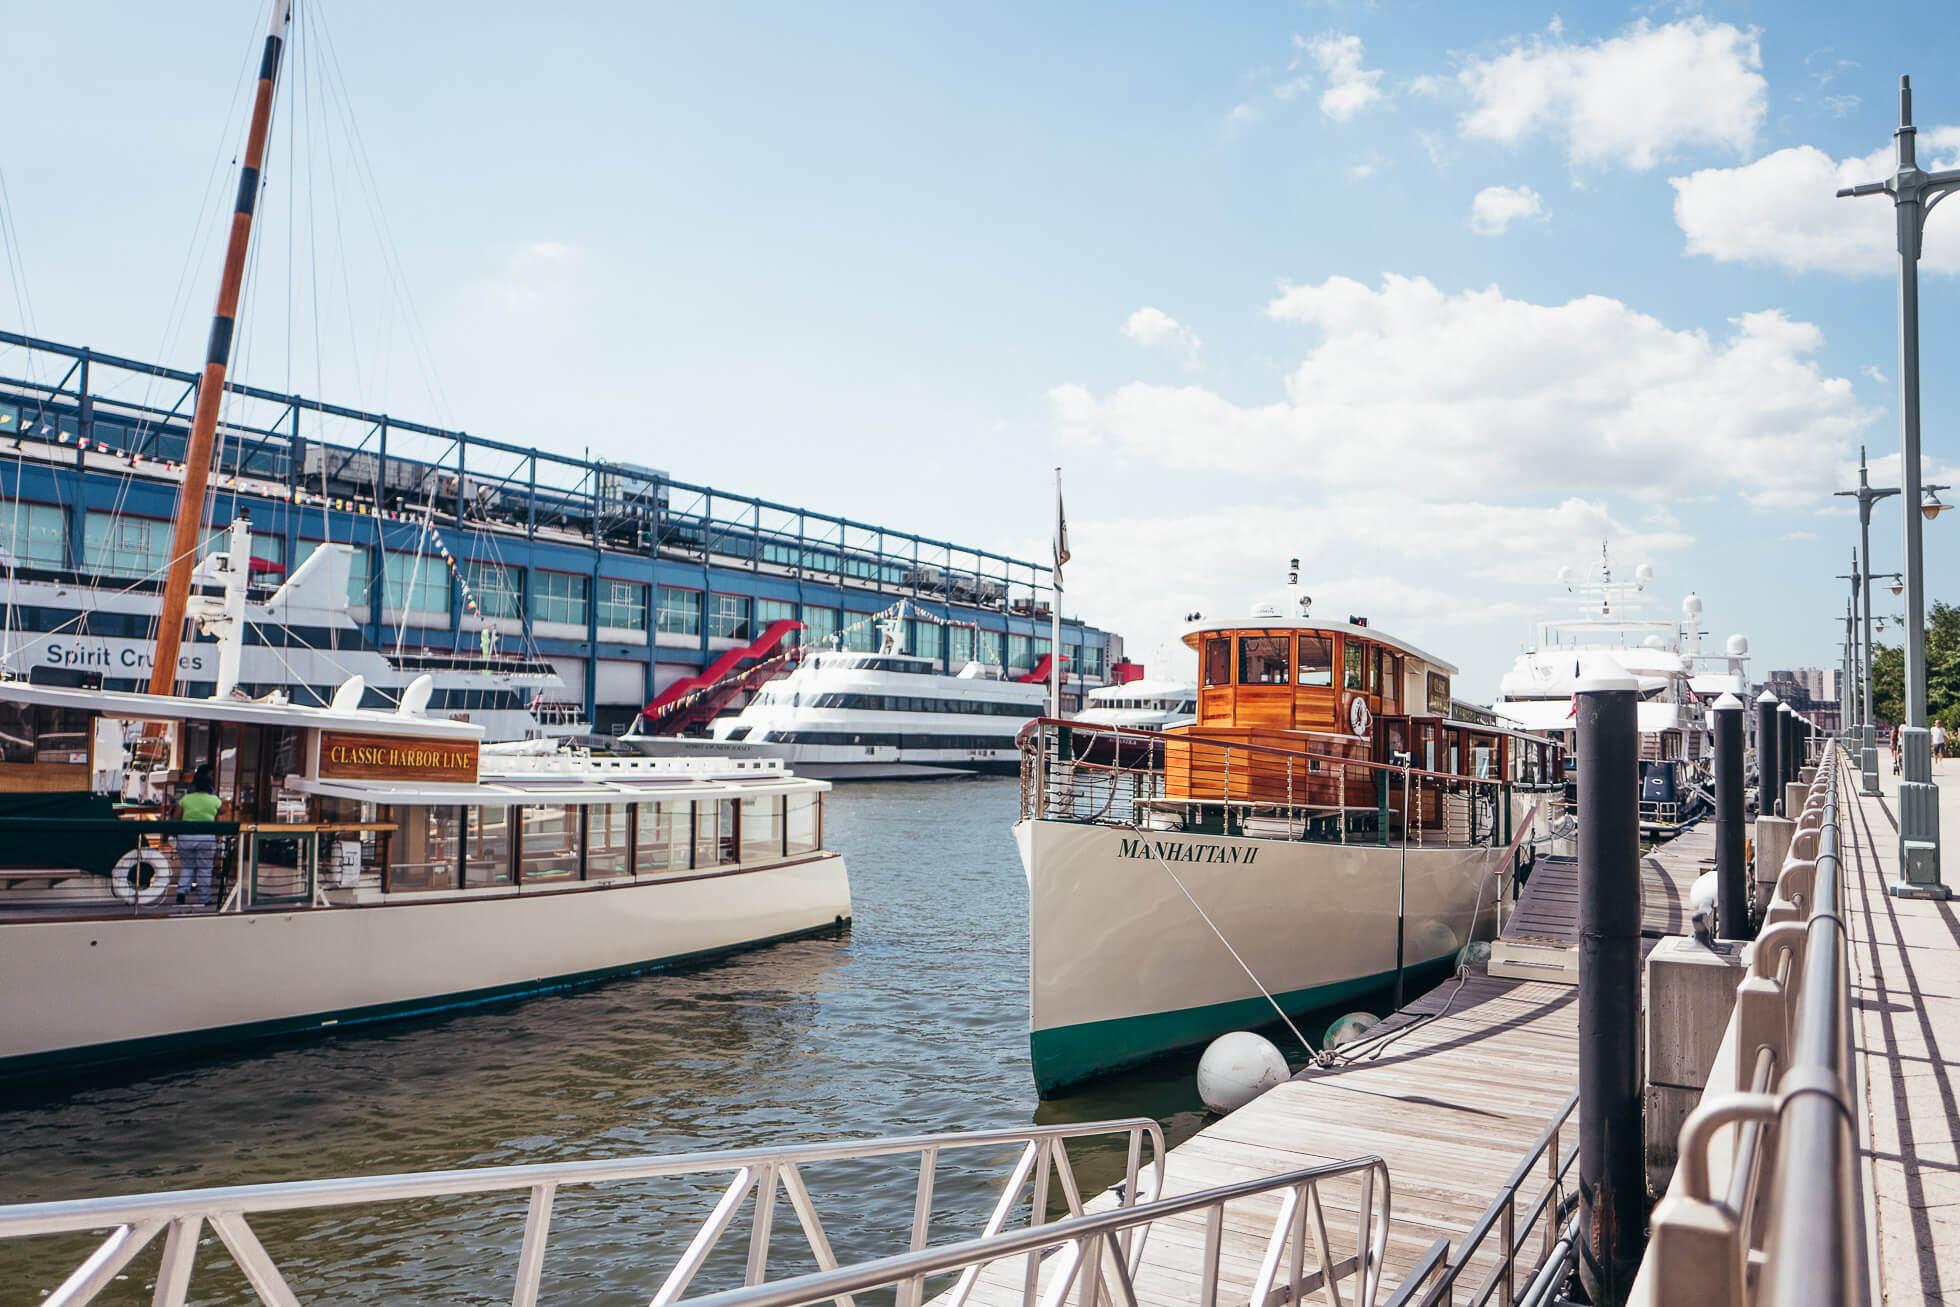 janni-deler-new-york-tour-boatL1090388